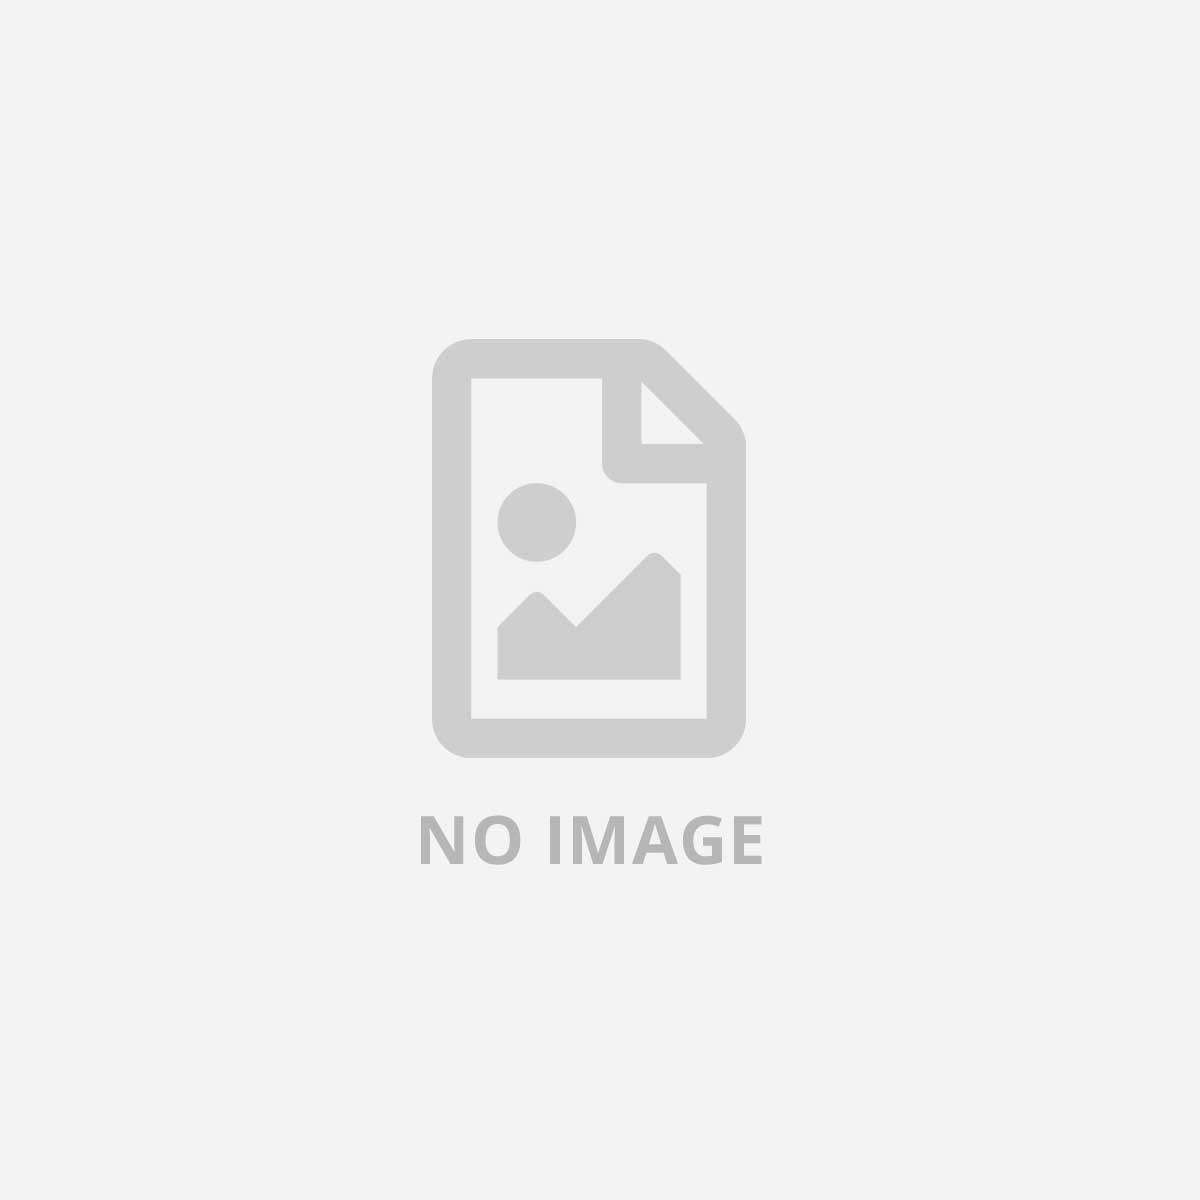 TRANSCEND 8GB MICROSD CLASS10 NO ADATTATORE